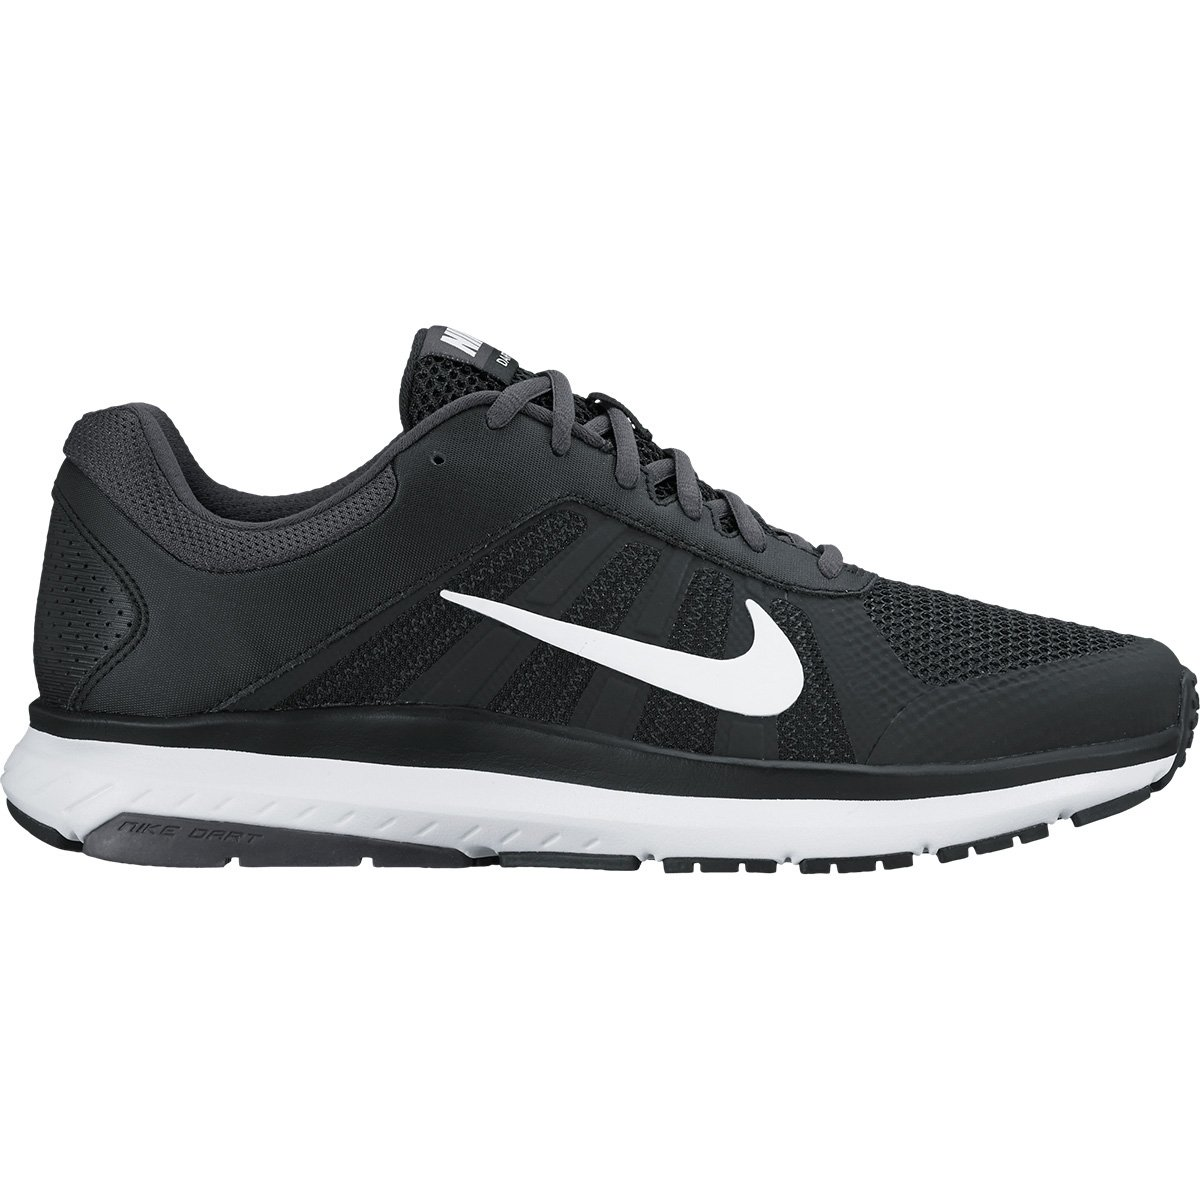 8888583bc2 Tênis Nike Dart 12 MSL Masculino